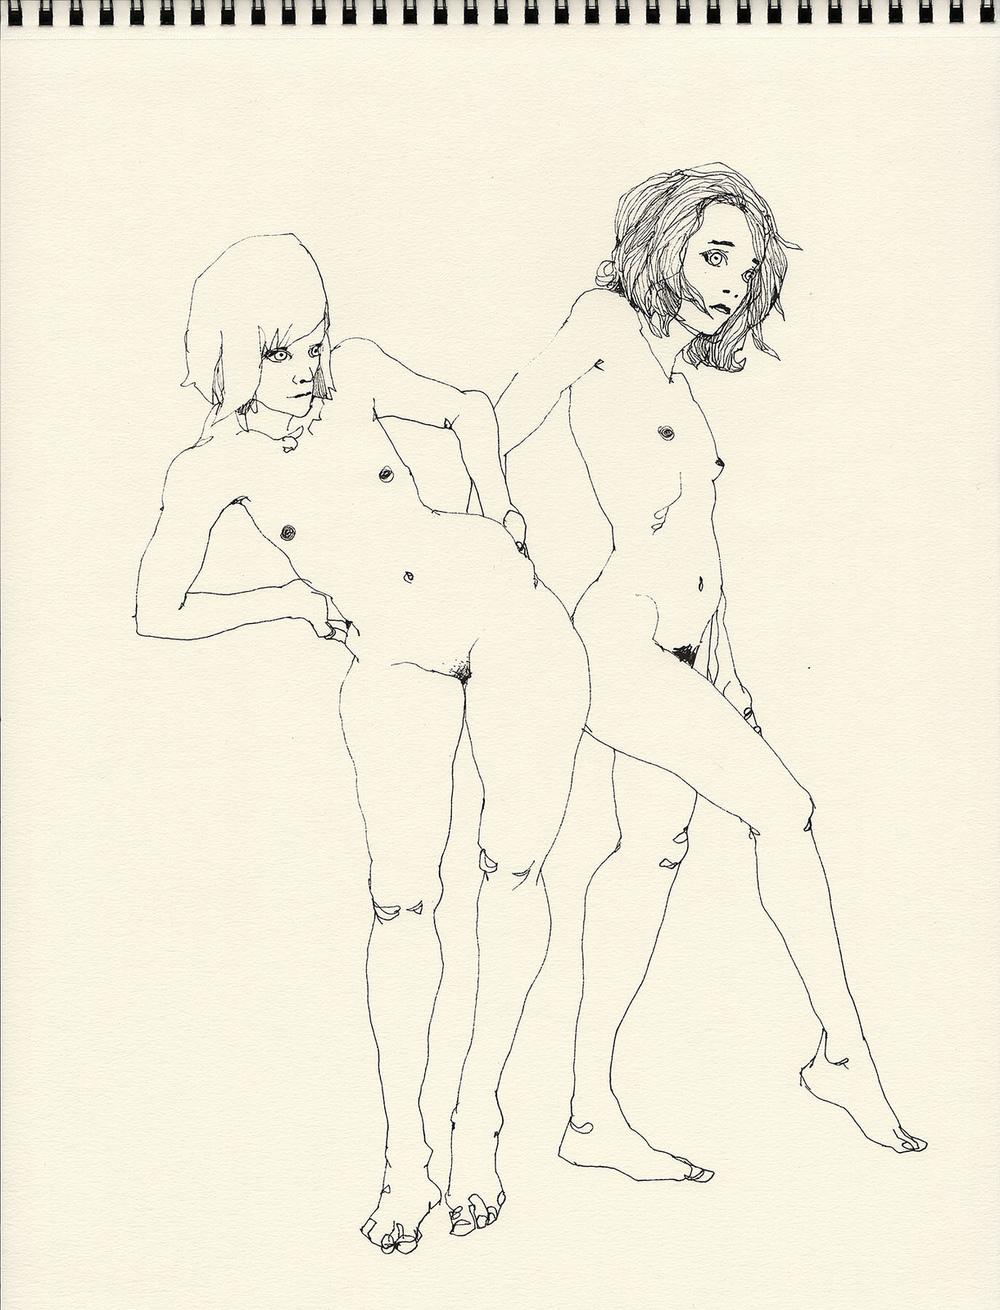 the-tree-mag-drawings-by-lu-cong-40.jpg